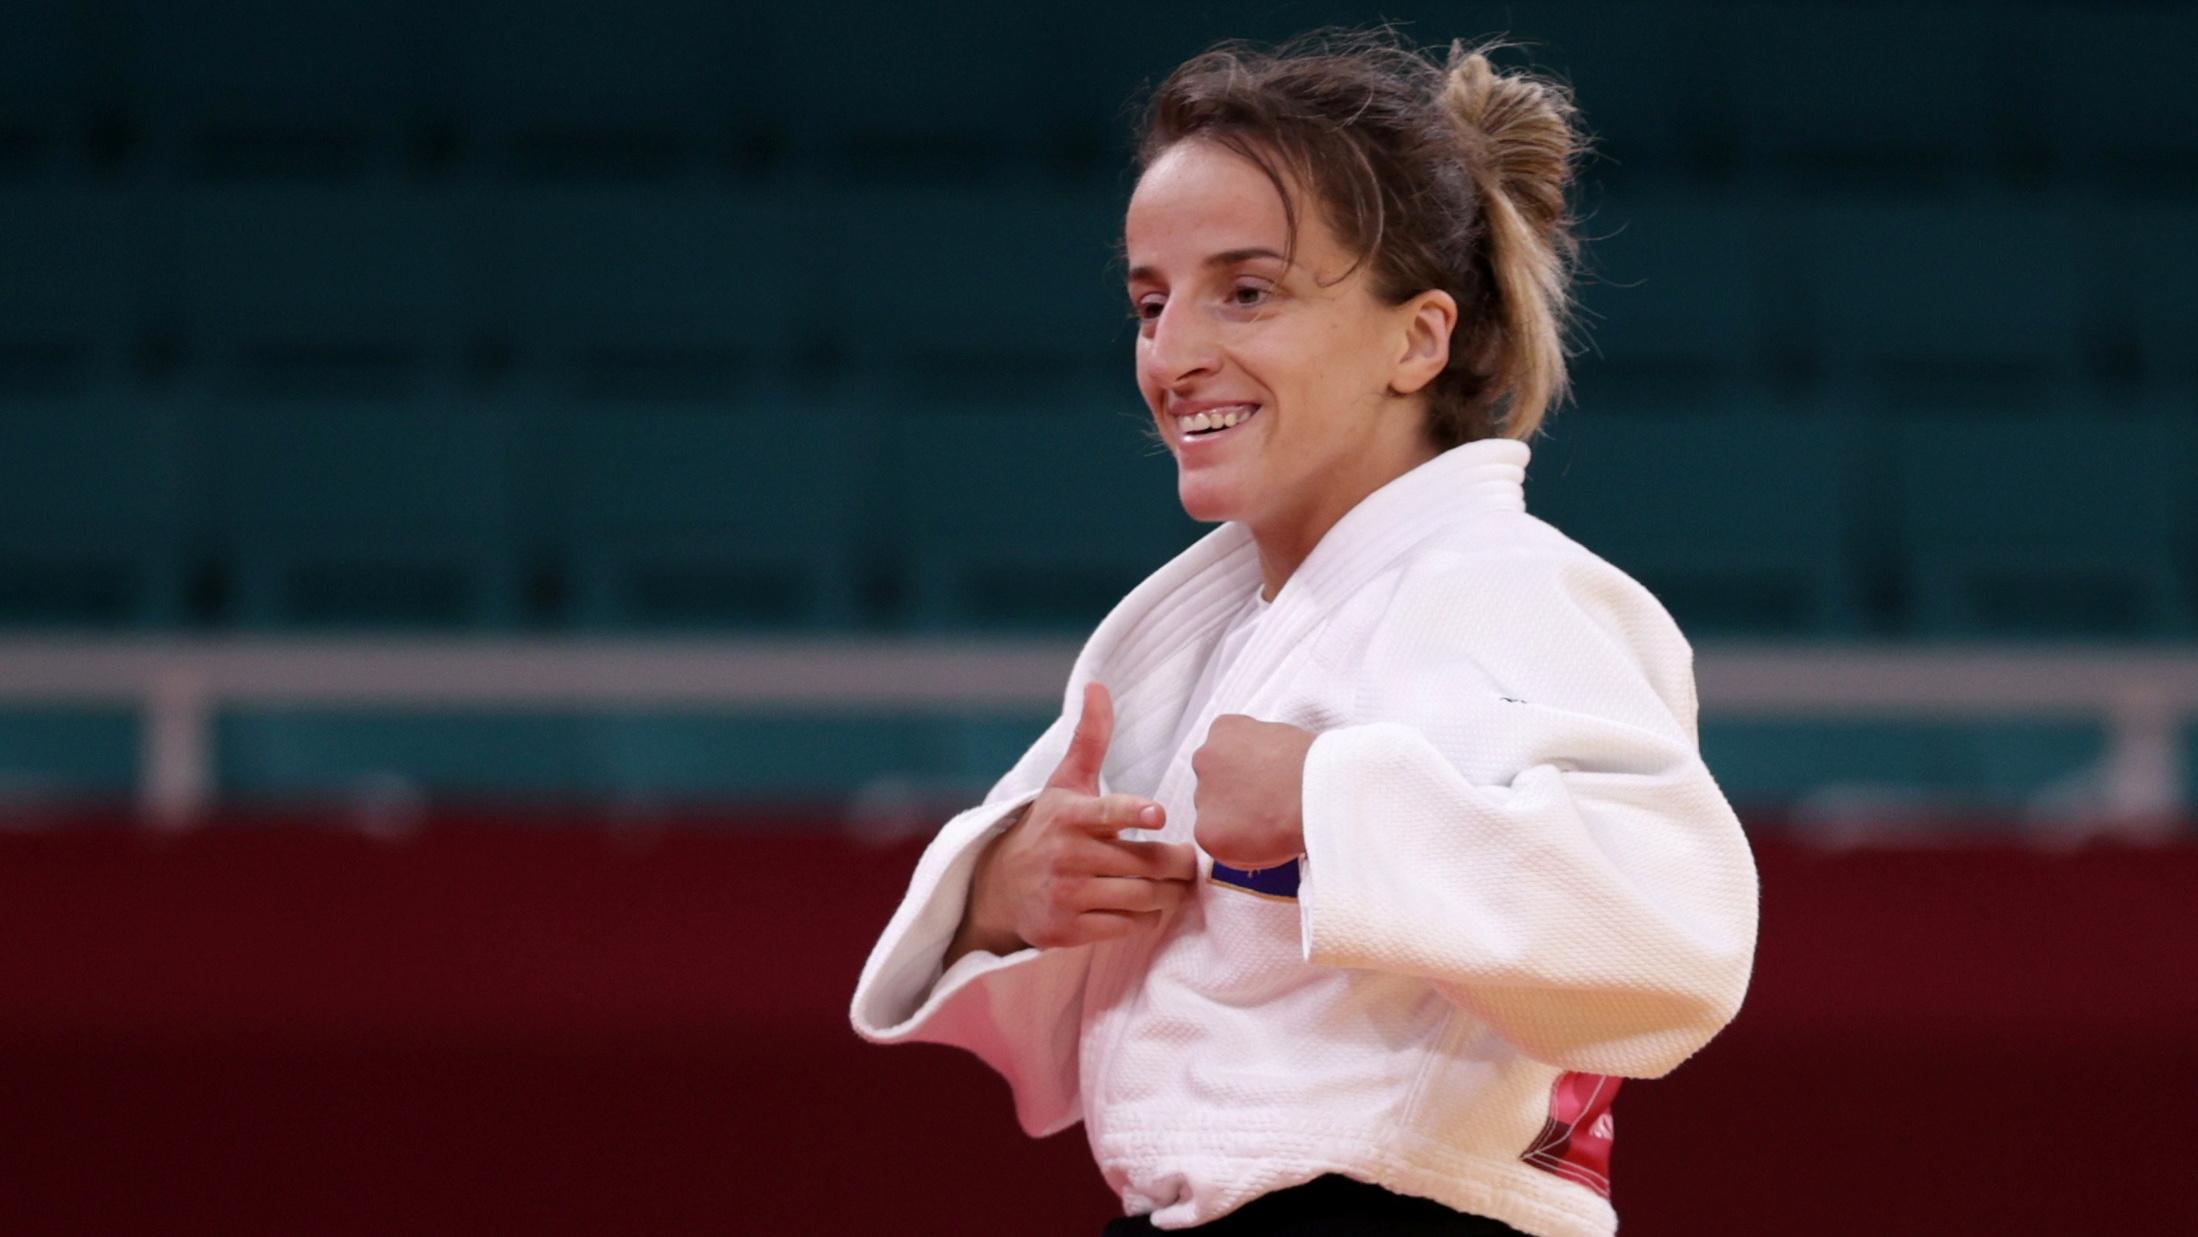 Tokyo 2020 Olympics - Judo -  Women's 48kg - Semifinal - Nippon Budokan - Tokyo, Japan - July 24, 2021. Distria Krasniqi of Kosovo reacts after winning REUTERS/Hannah Mckay